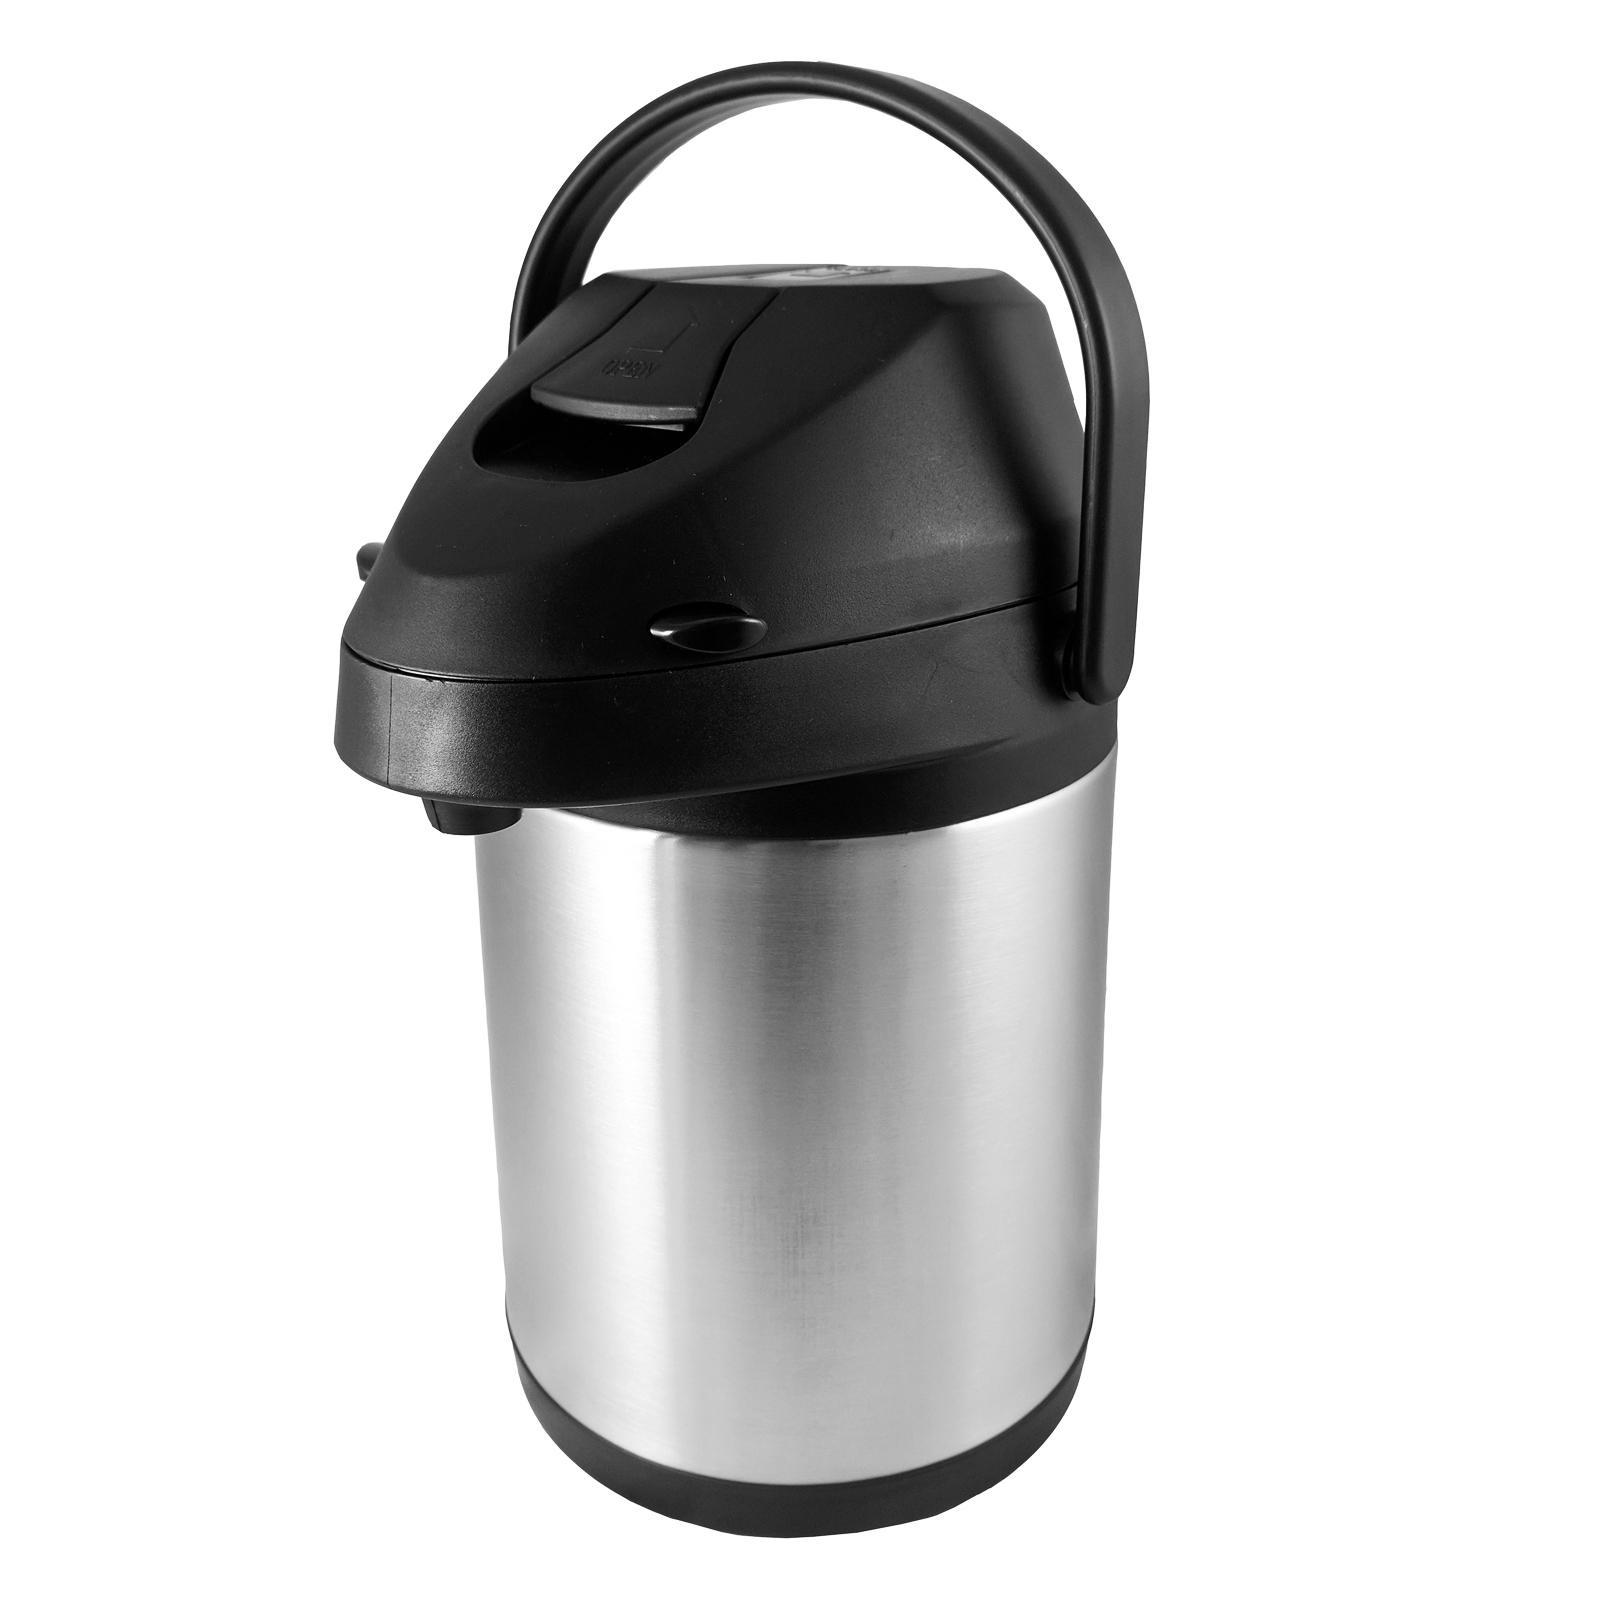 ALS Stainless Steel Vacuum Air Pot 2.5L